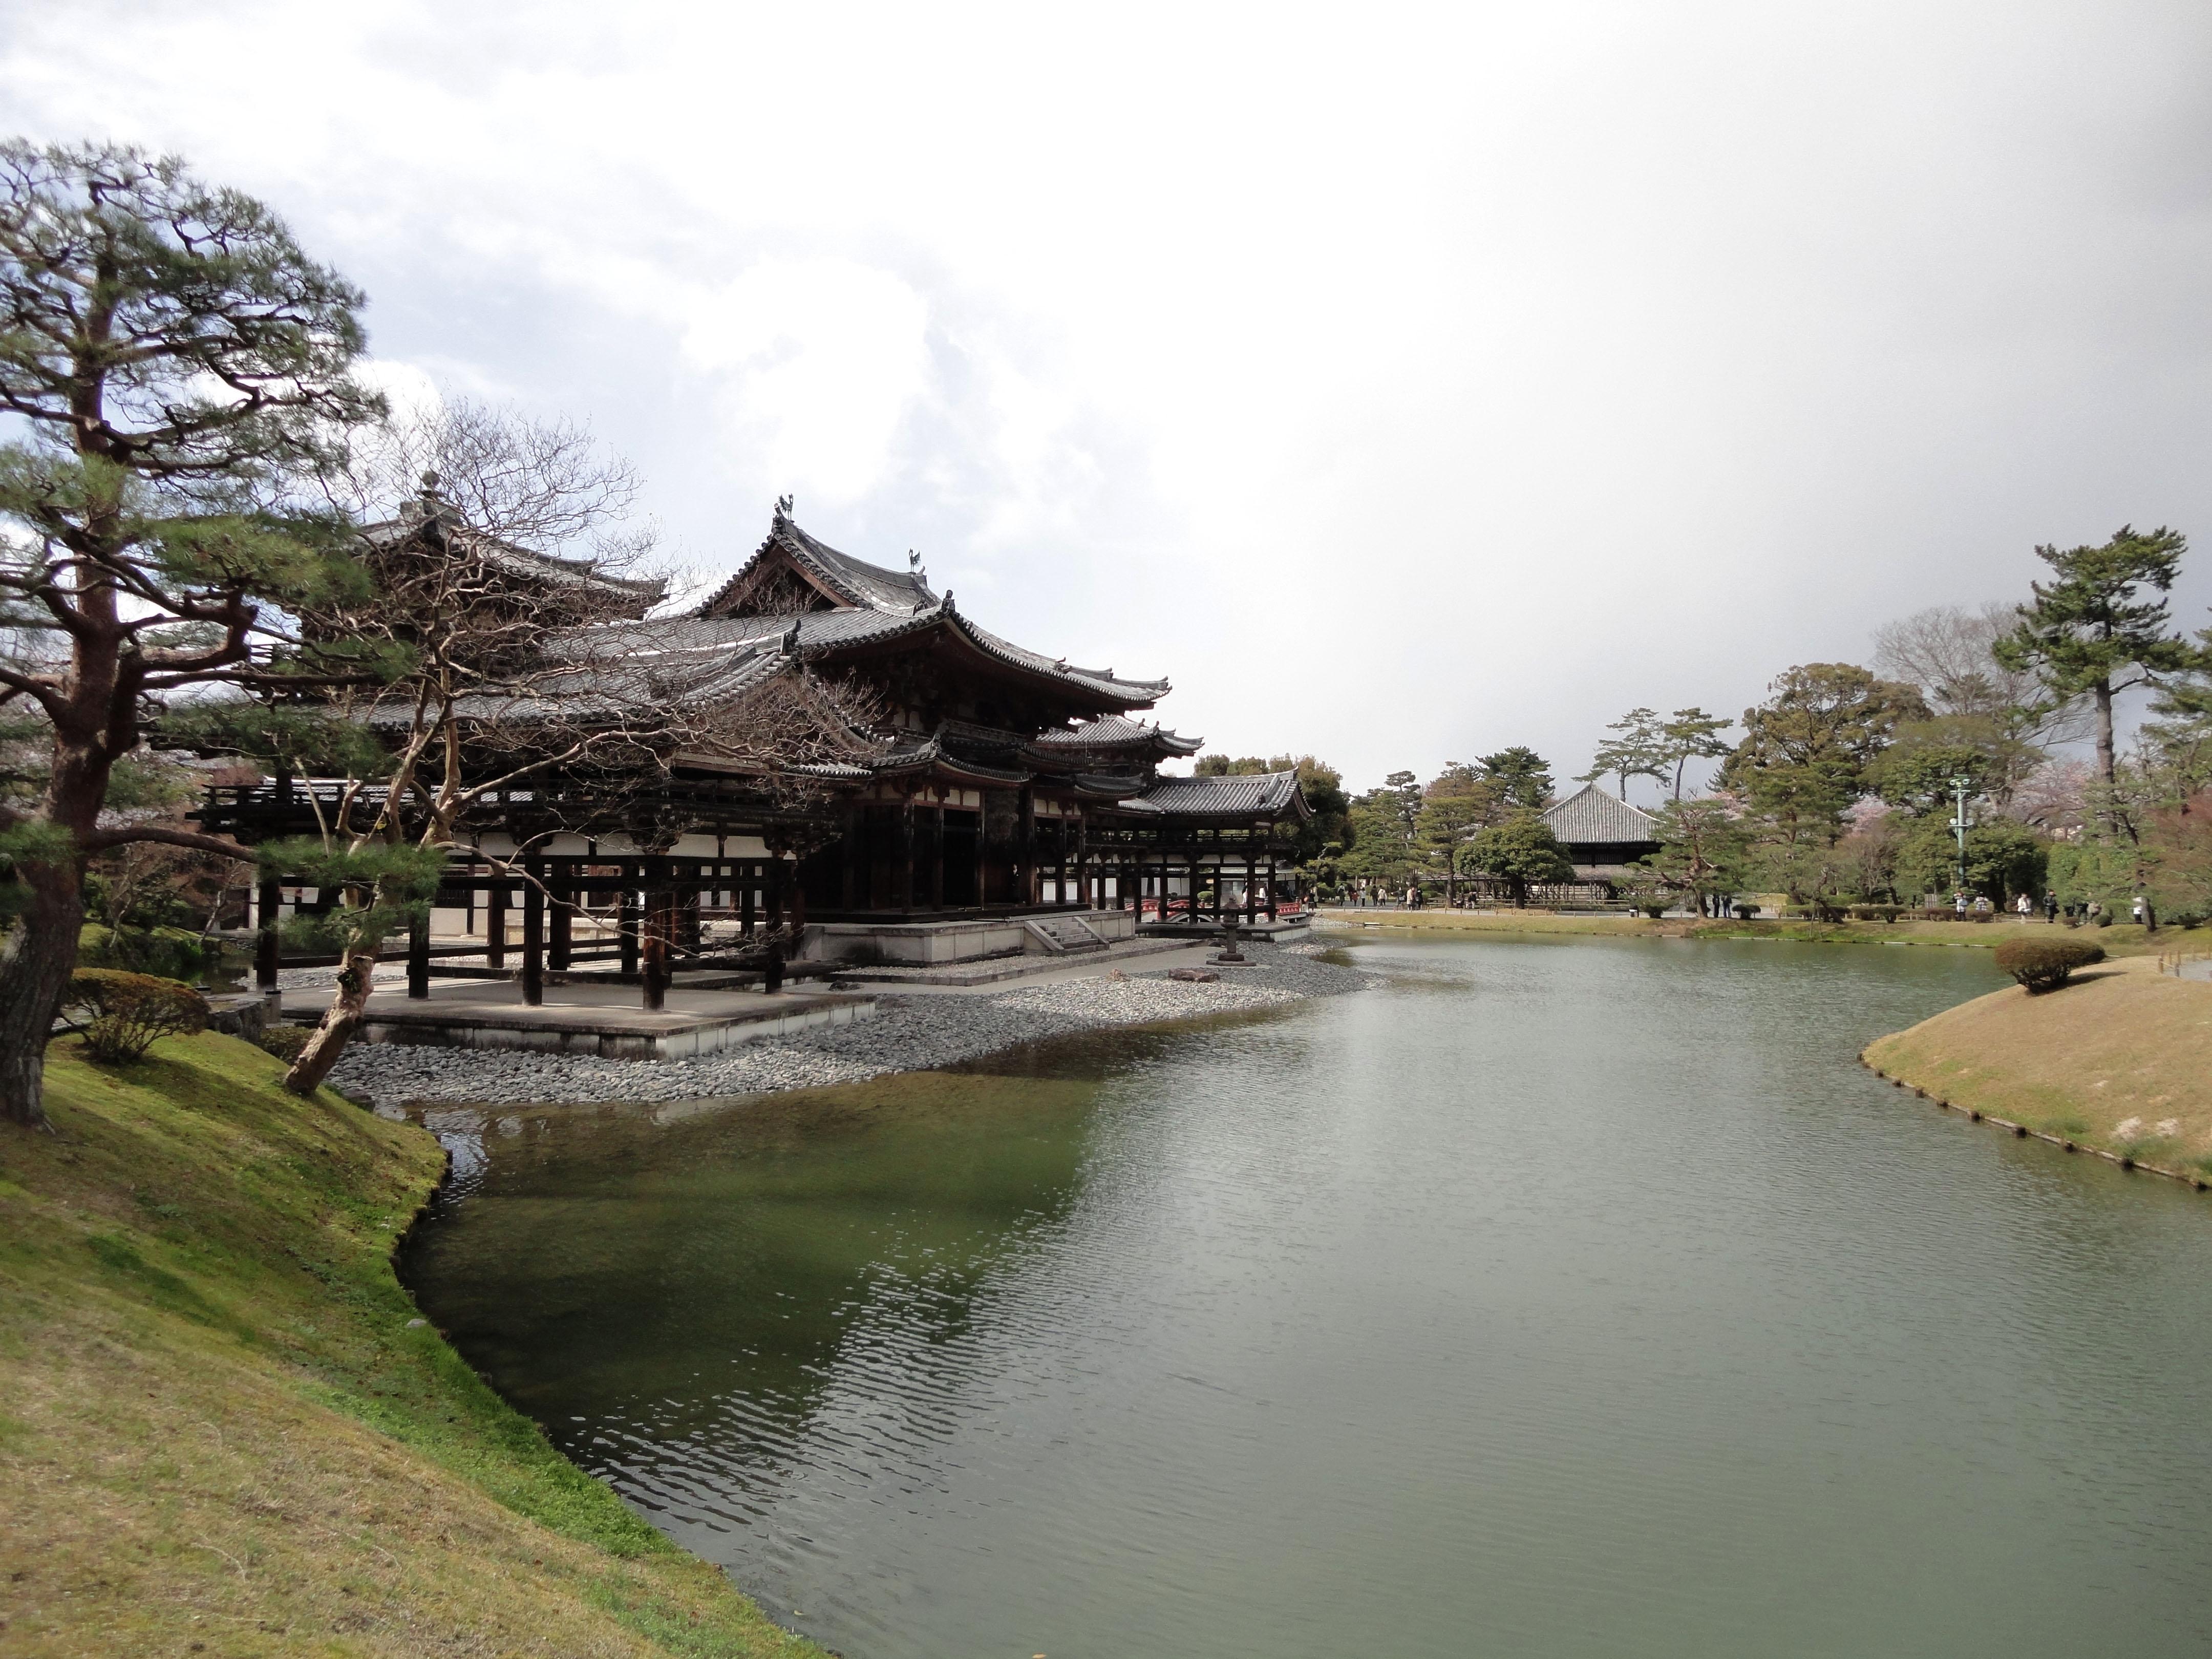 Byodo in temple Phoenix Hall Jodo shiki garden pond side view Japan 01